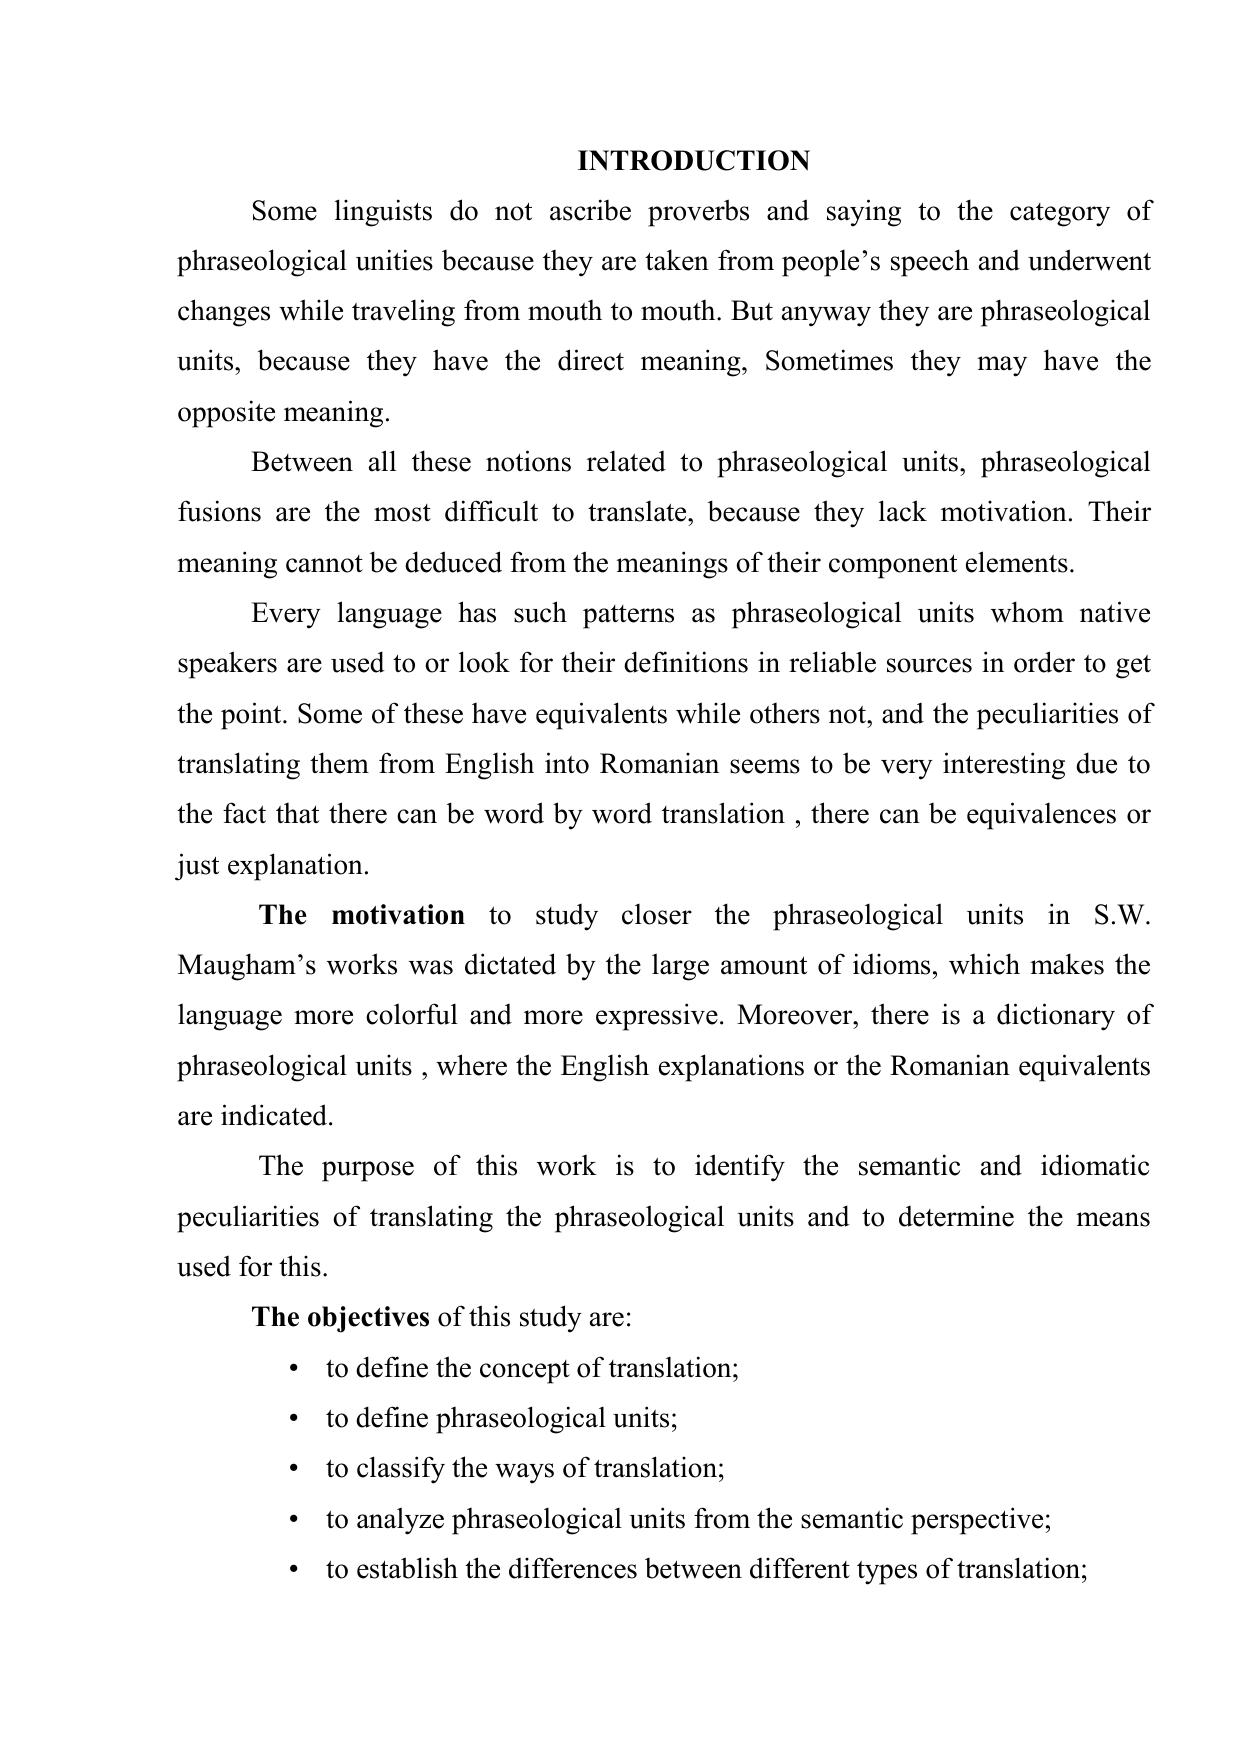 Phraseological units is a complex phenomenon term paper best descriptive essay proofreading website au